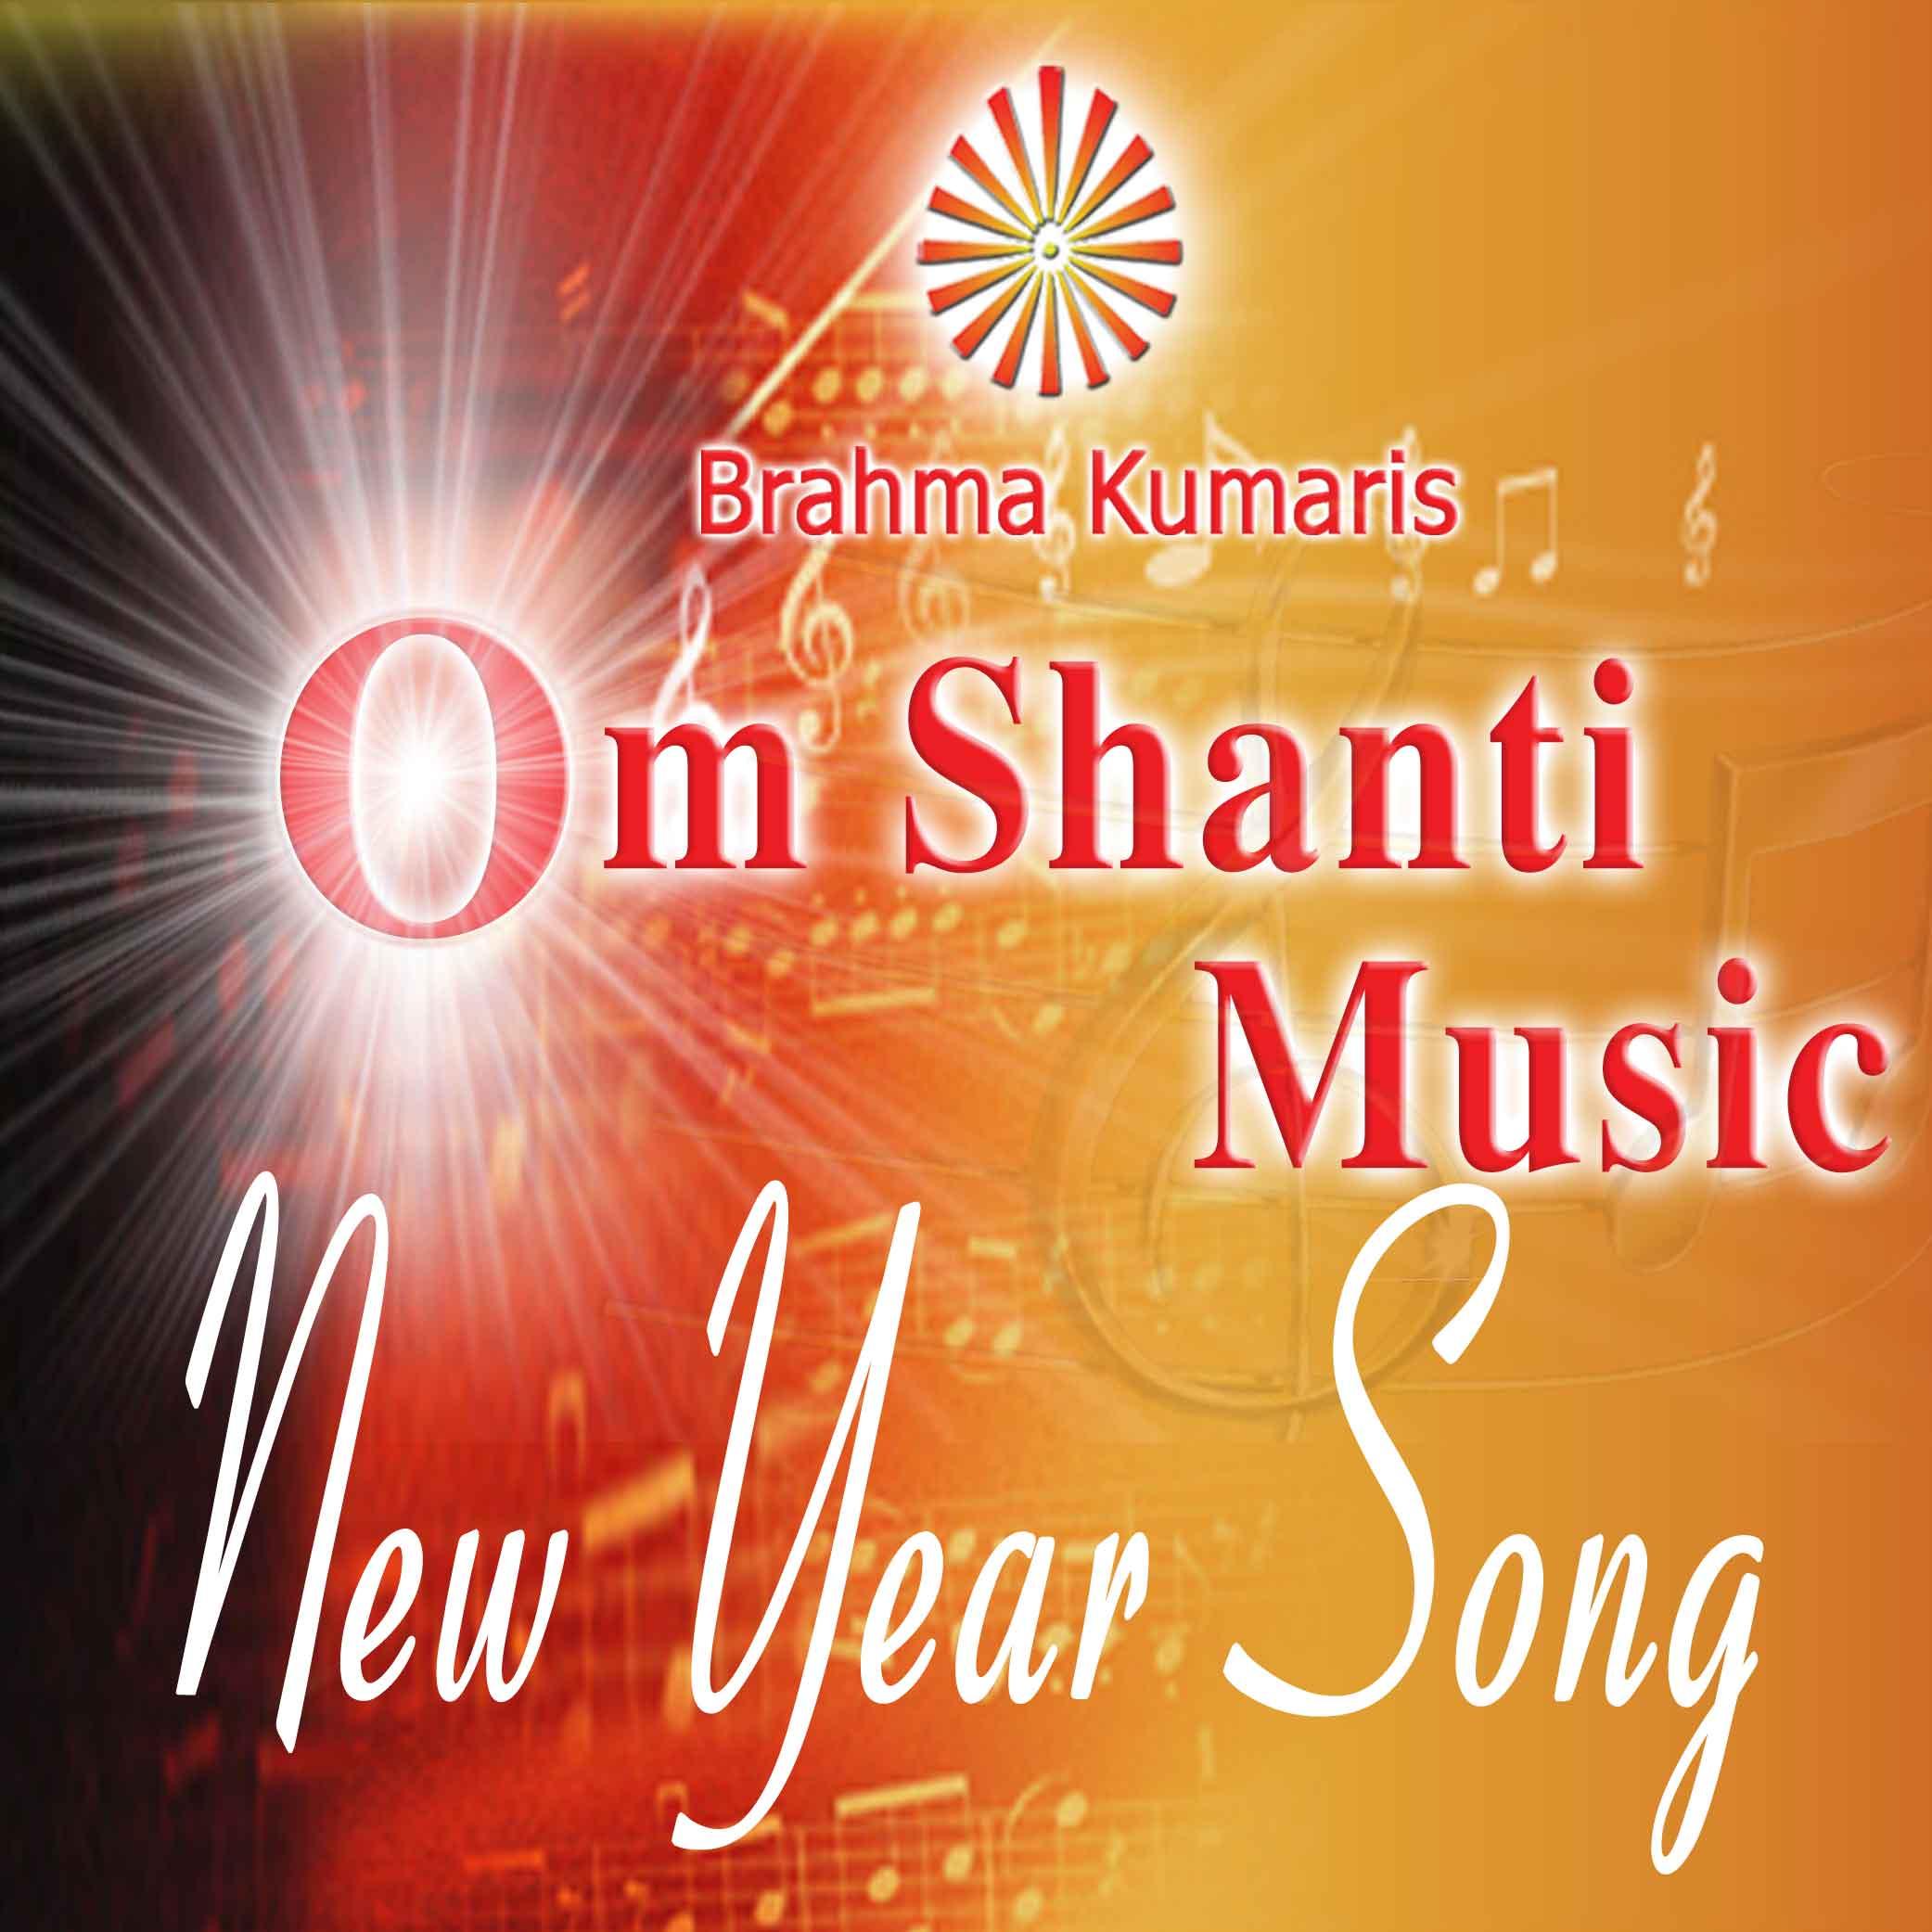 Live Wallpaper Happy New Year Brahma Kumaris